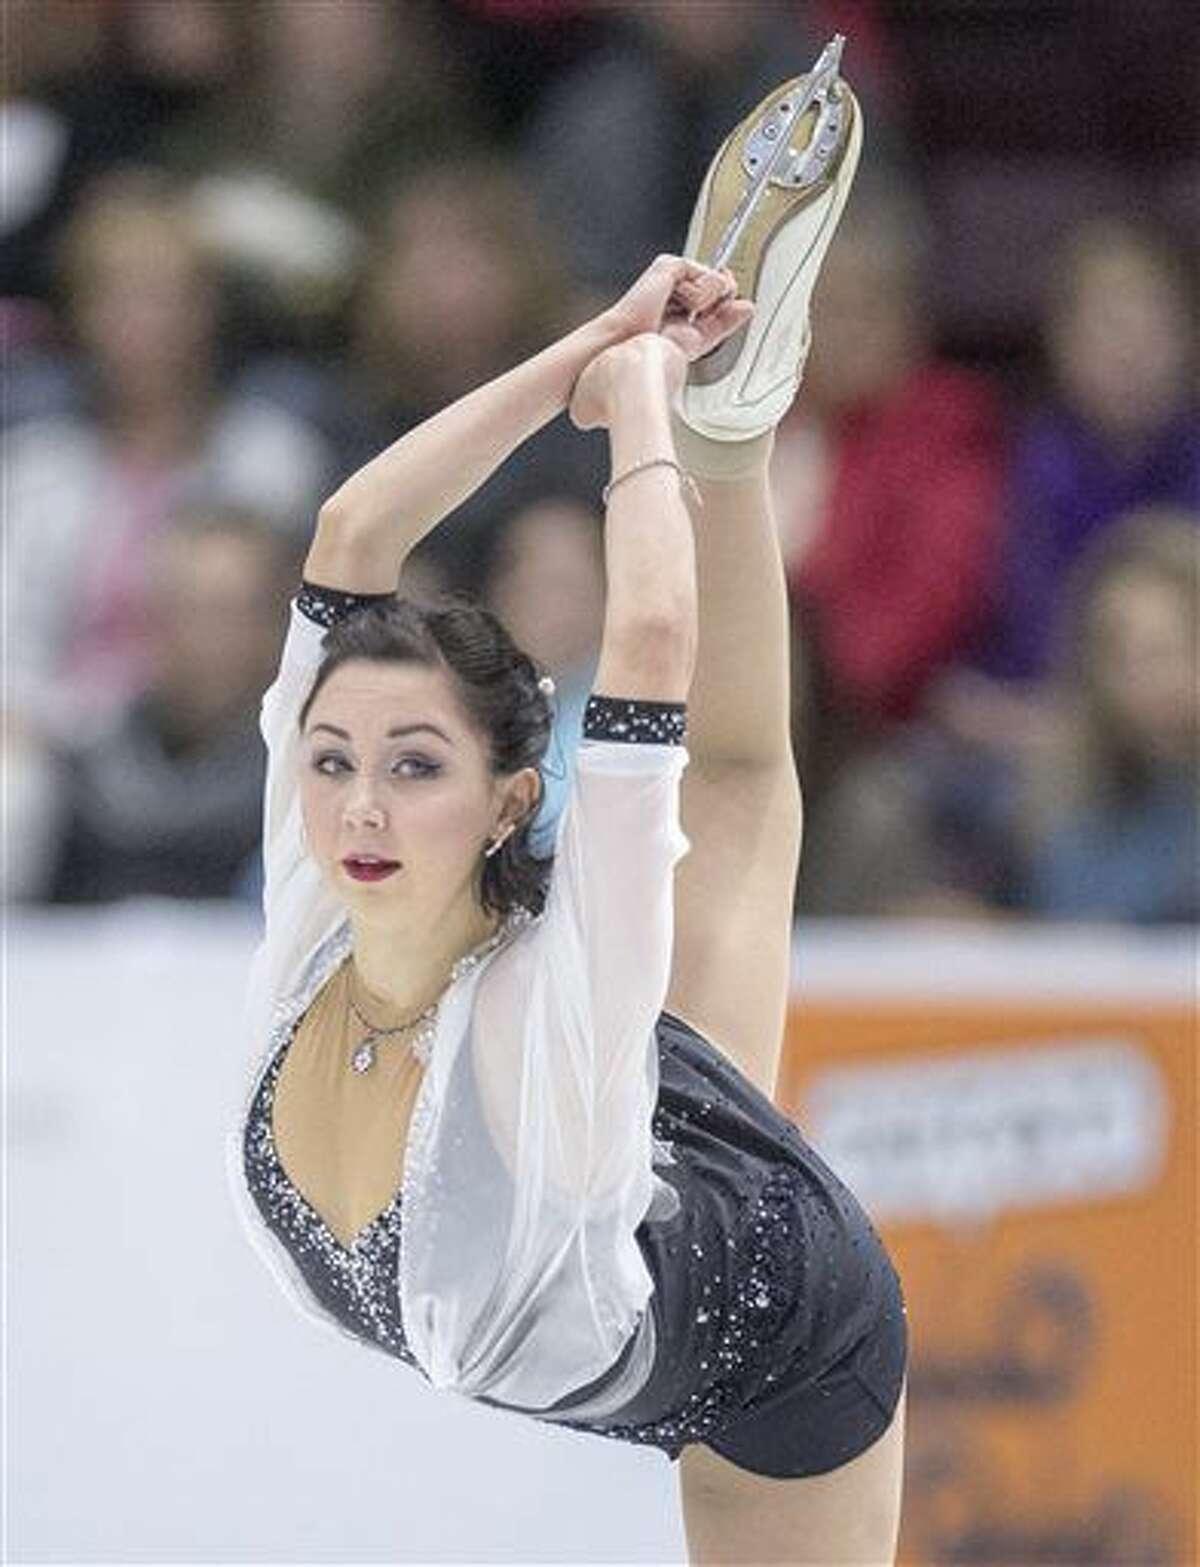 Russia's Elizaveta Tuktamysheva performs in the ladies short program at Skate Canada International figure skating event, Friday, Oct. 28, 2016 in Mississauga, Ontario. (Frank Gunn/The Canadian Press via AP)